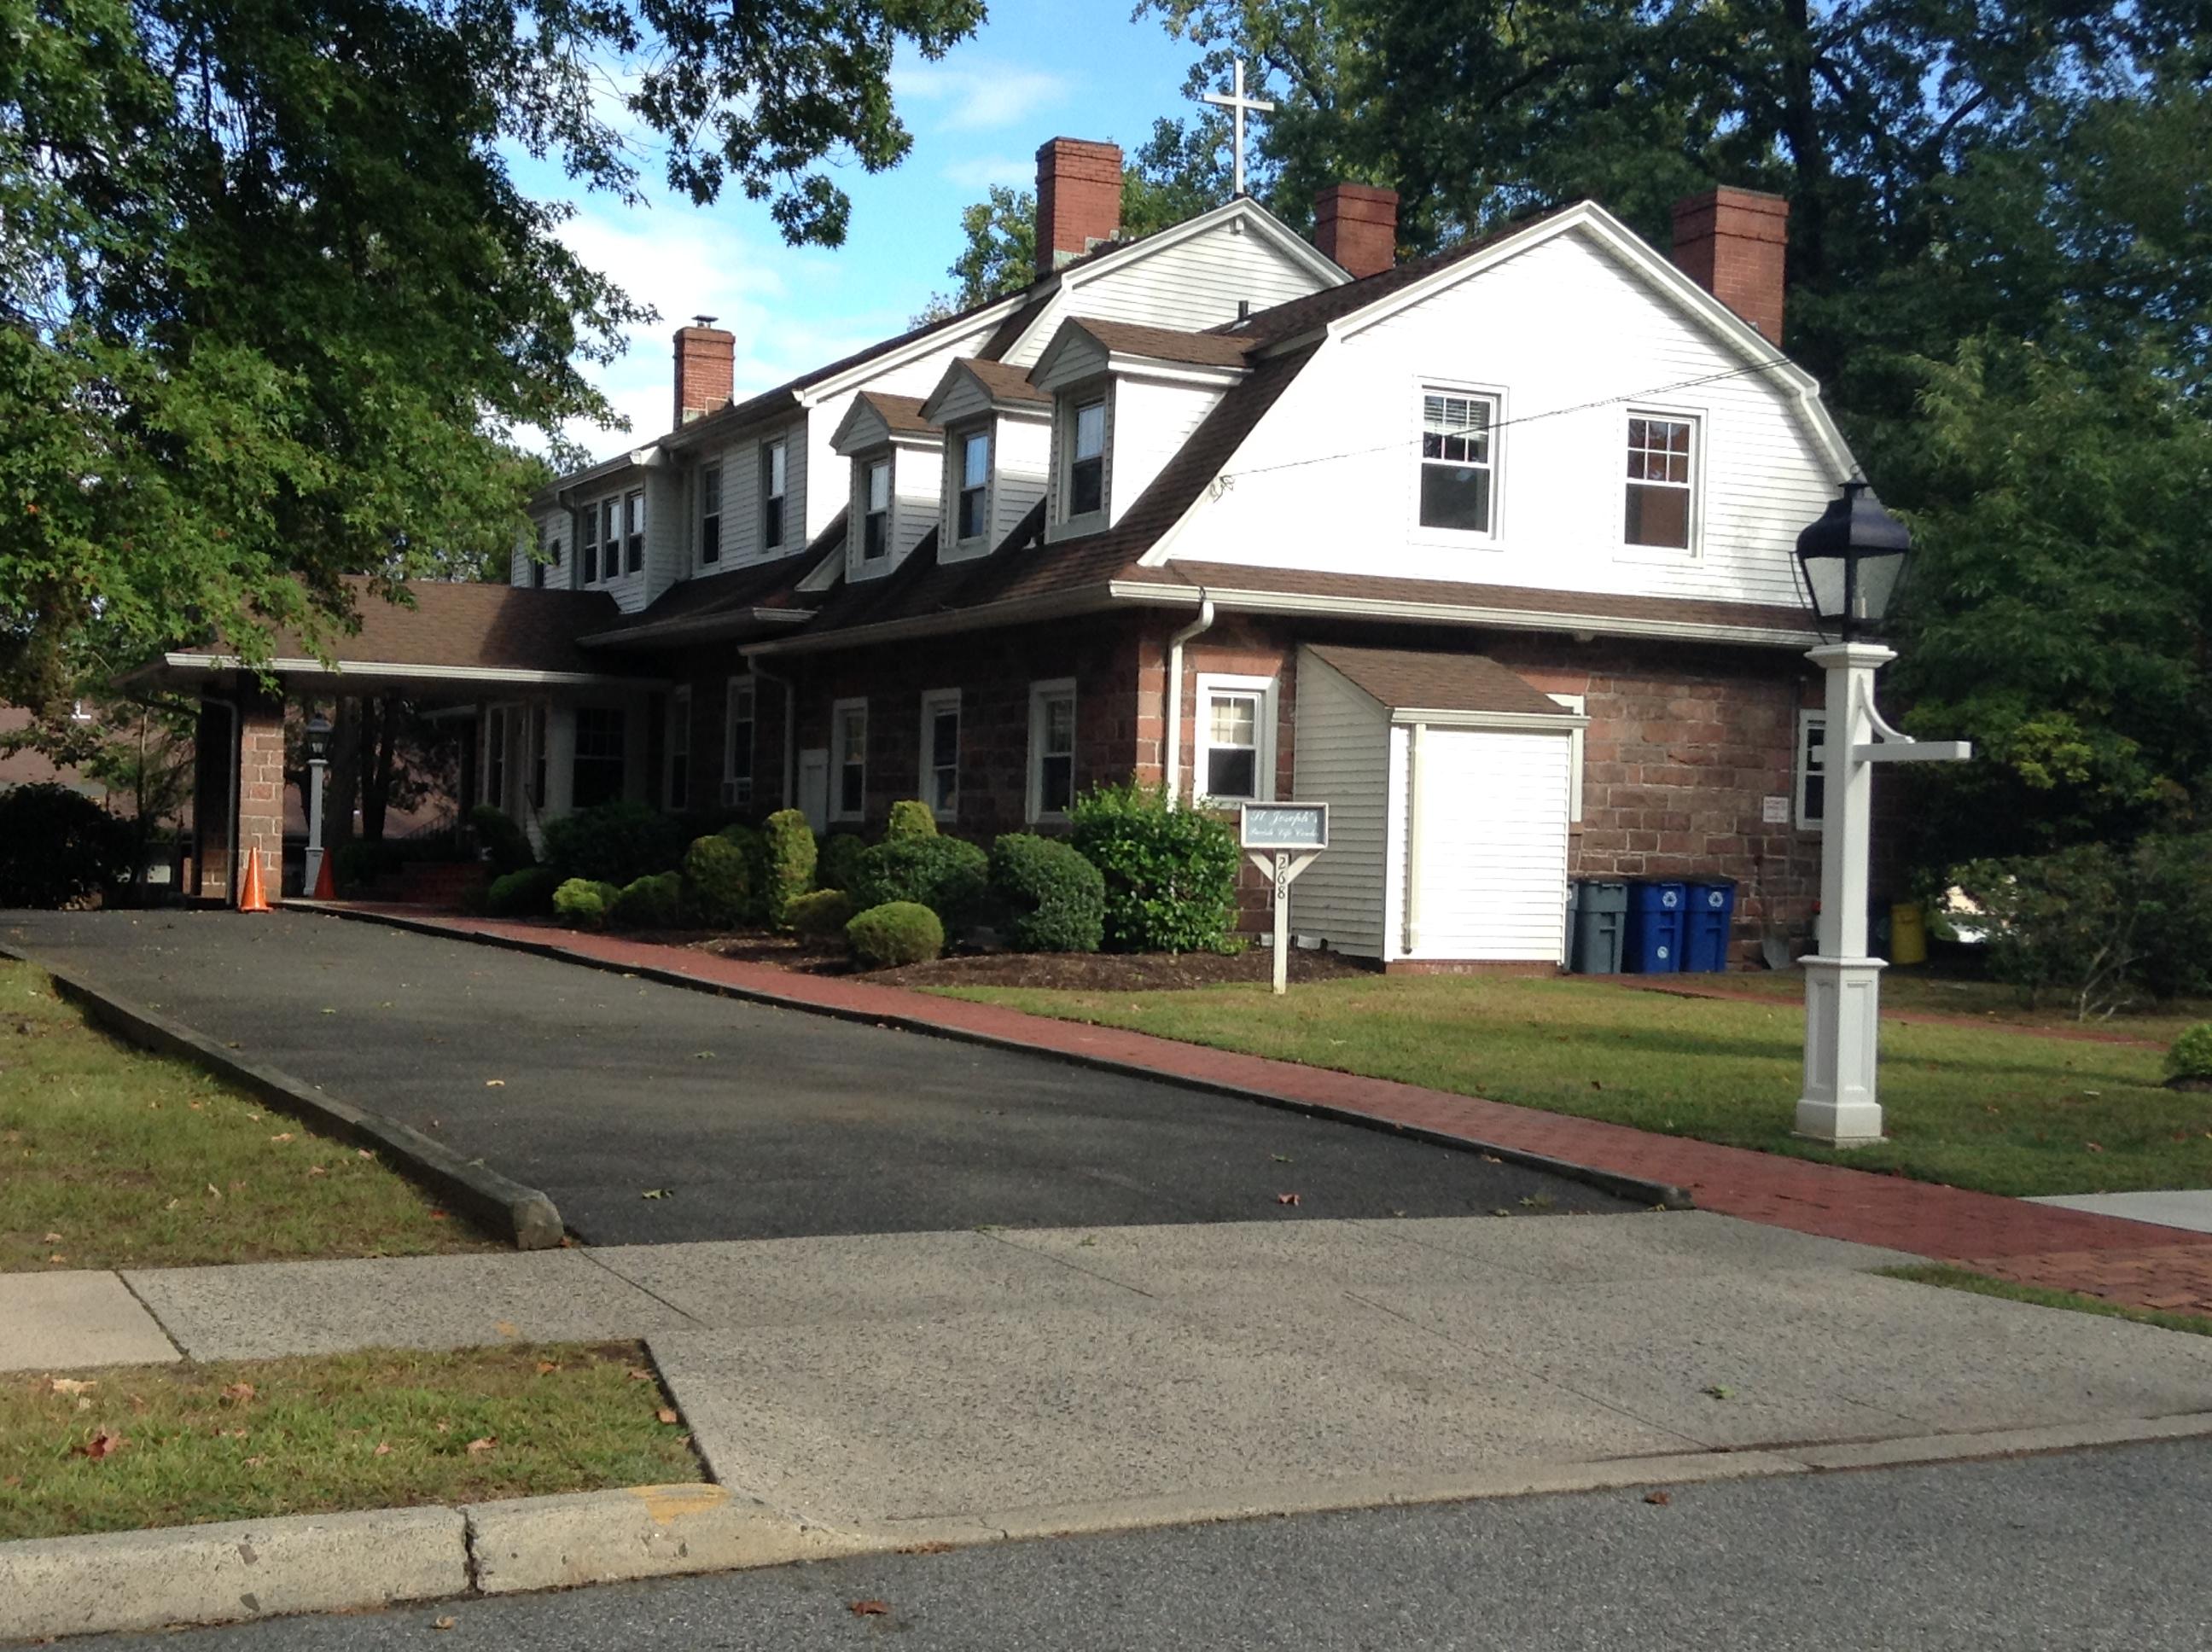 Demarest House (Oradell, New Jersey) - Wikipedia